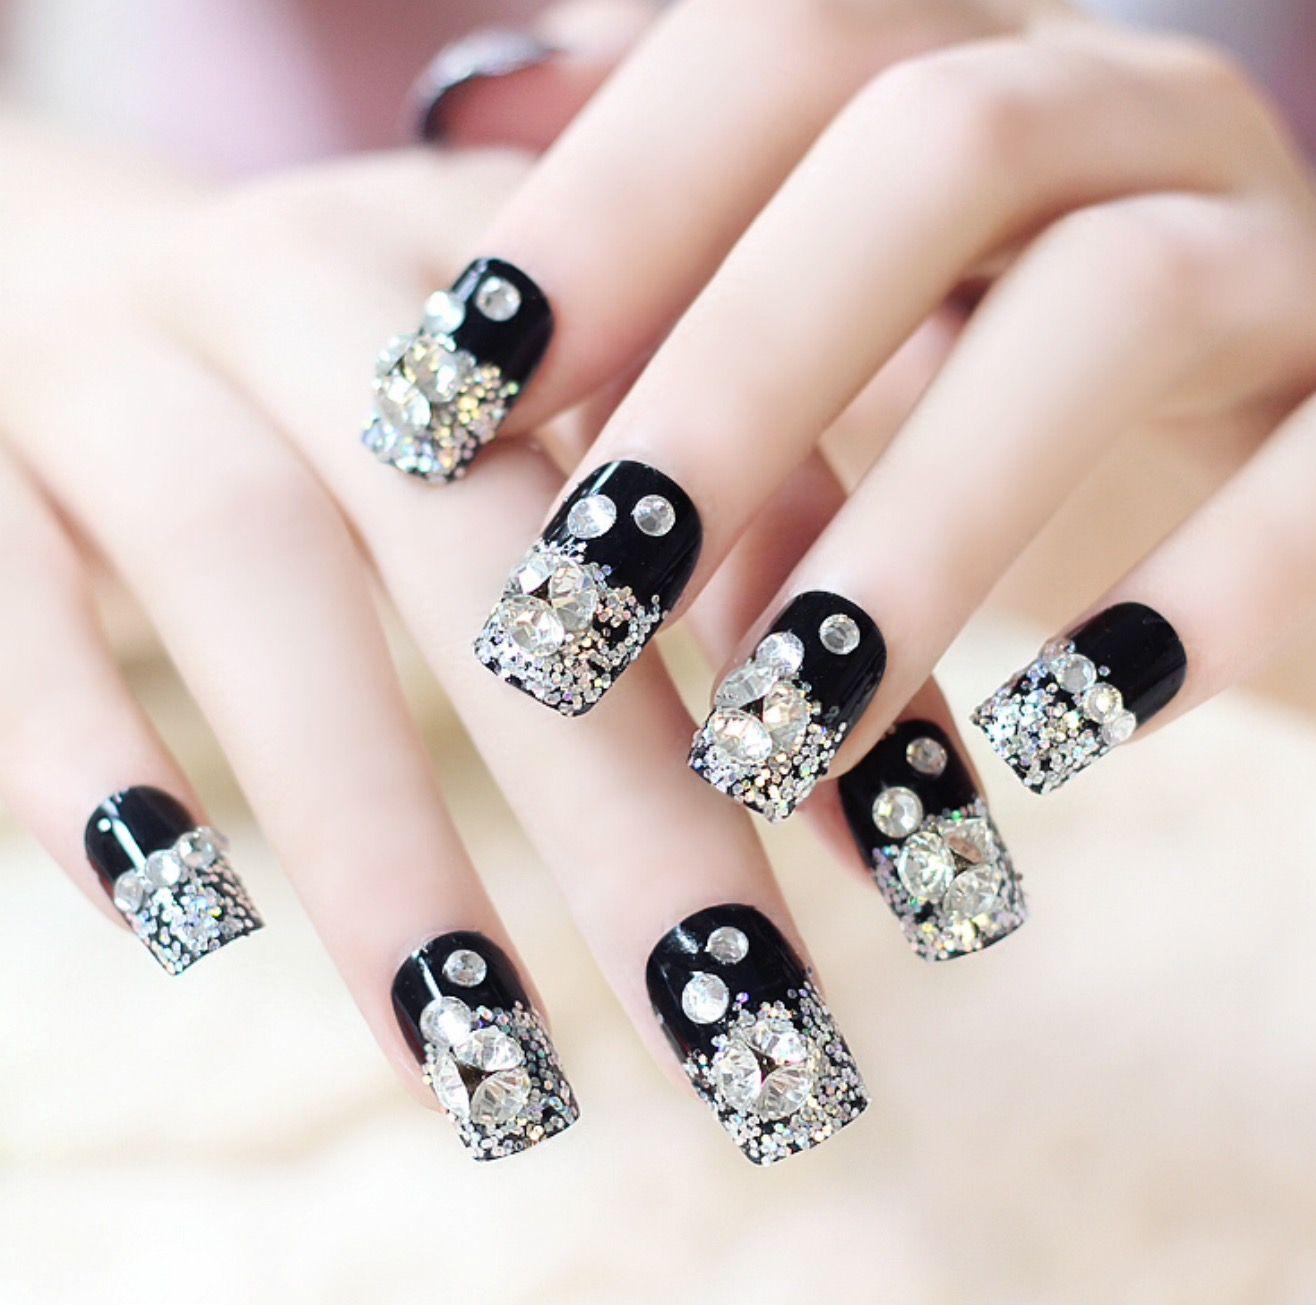 Pin by ChloeuNileh on Nail Art  Pinterest